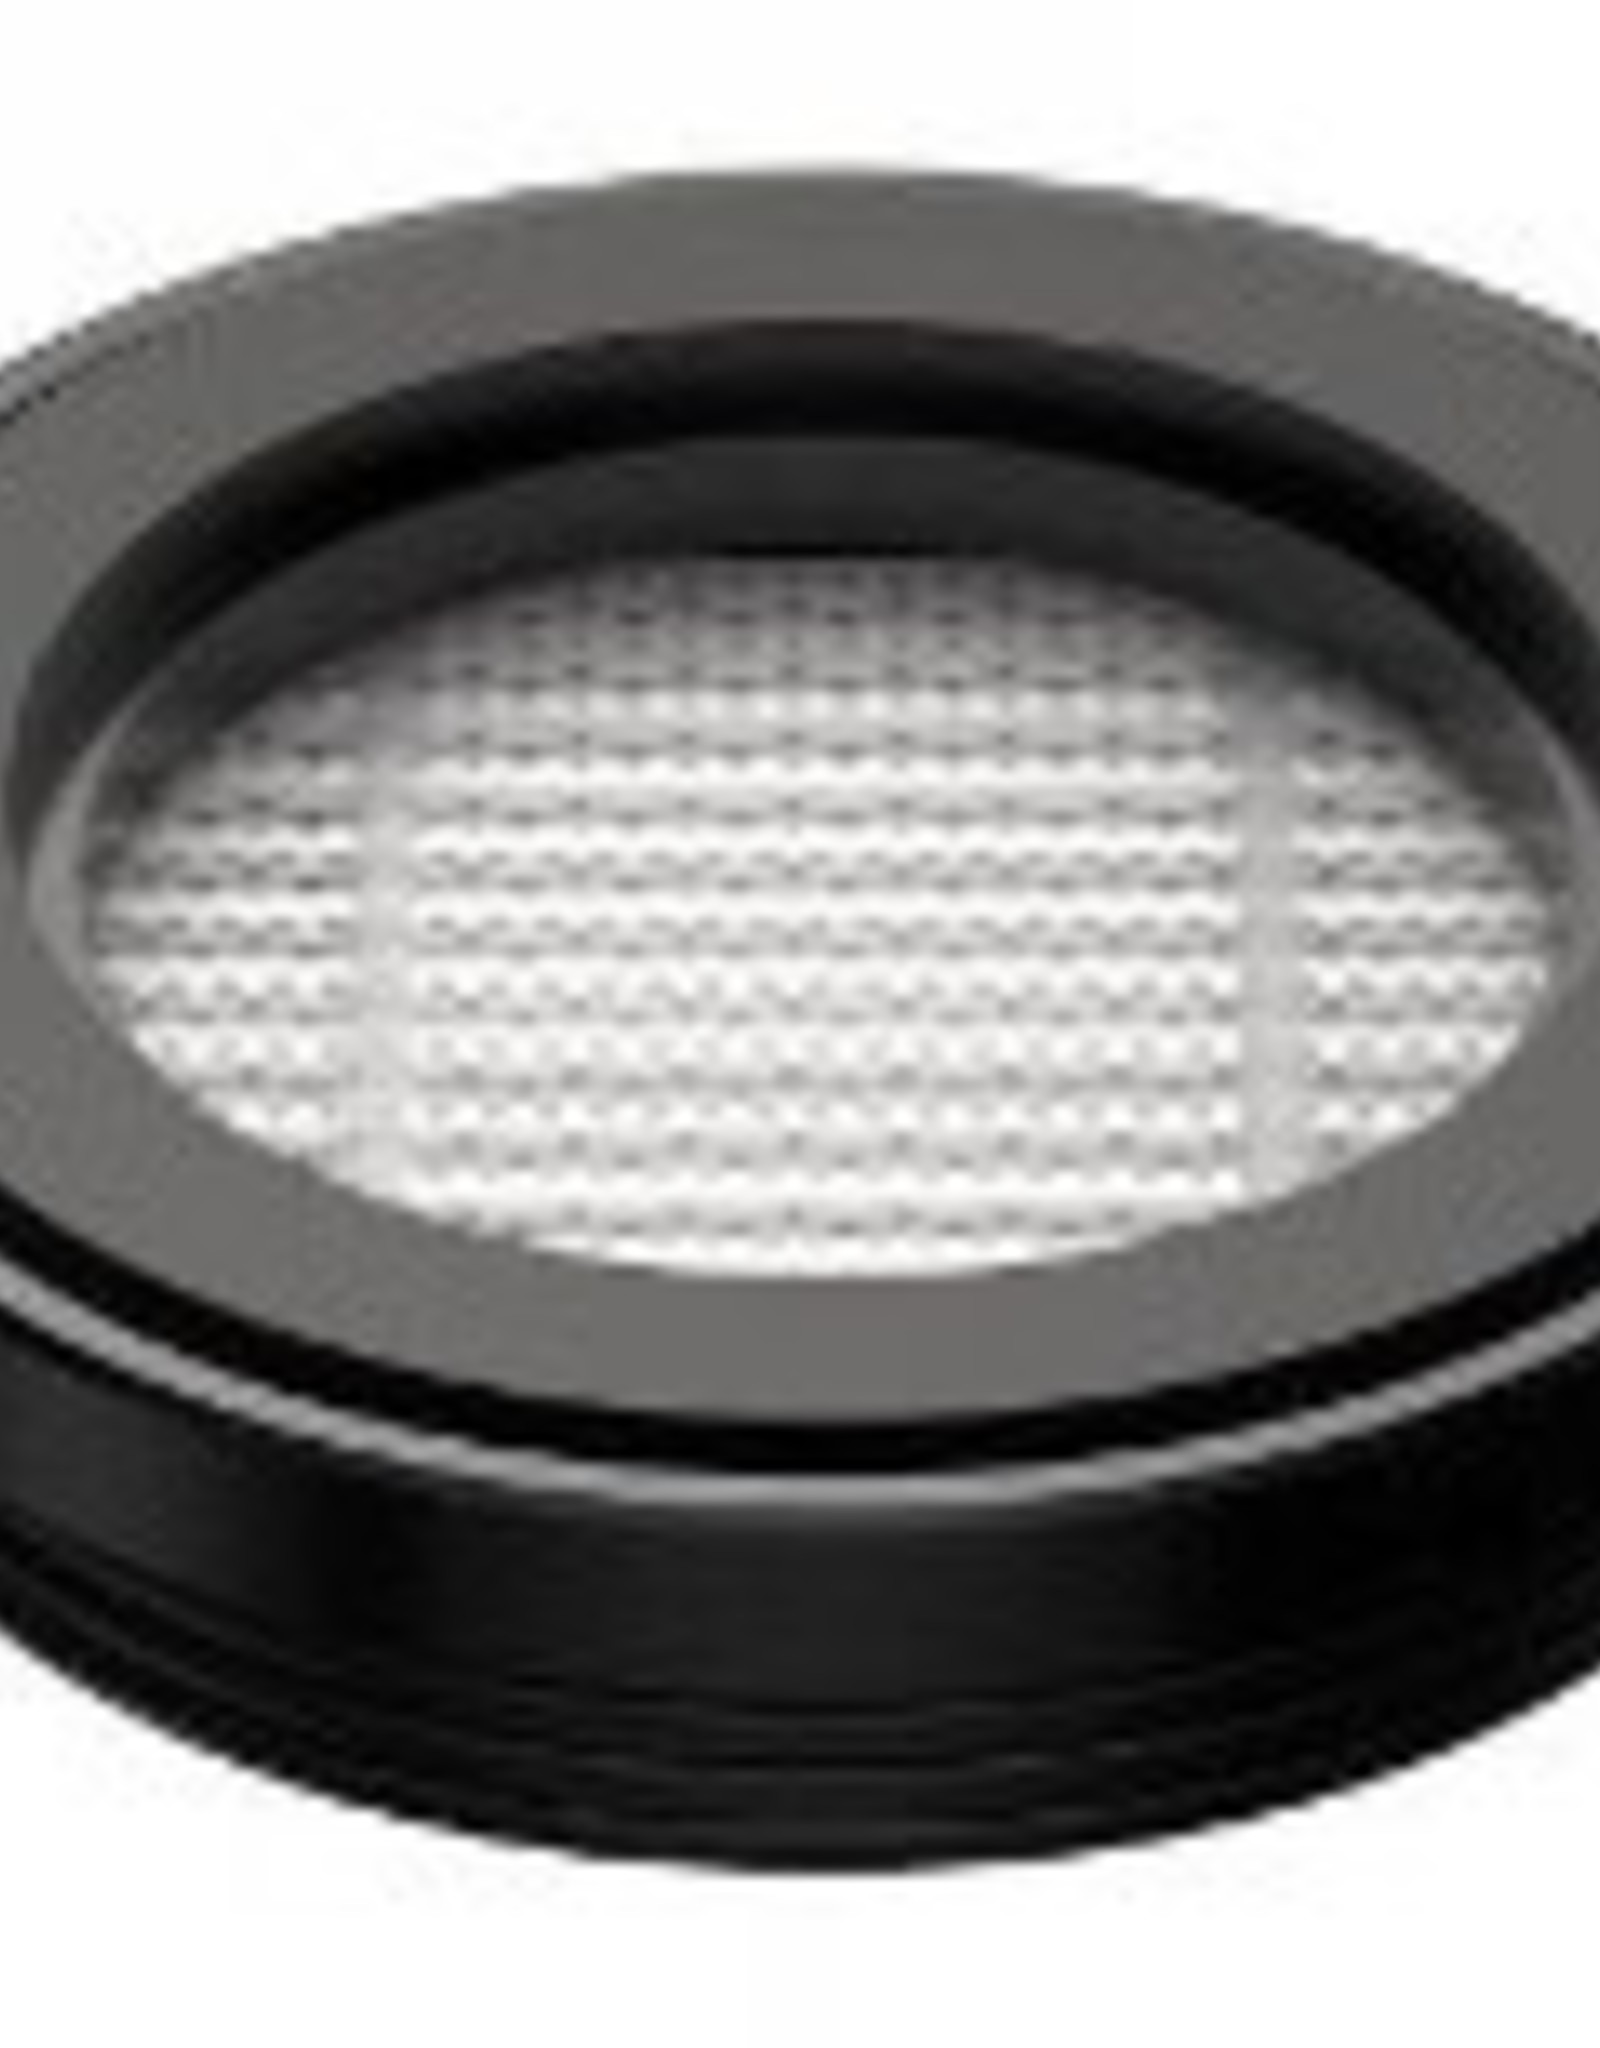 Baseus A2 car vacuum cleaner strainer(3PCS)Black